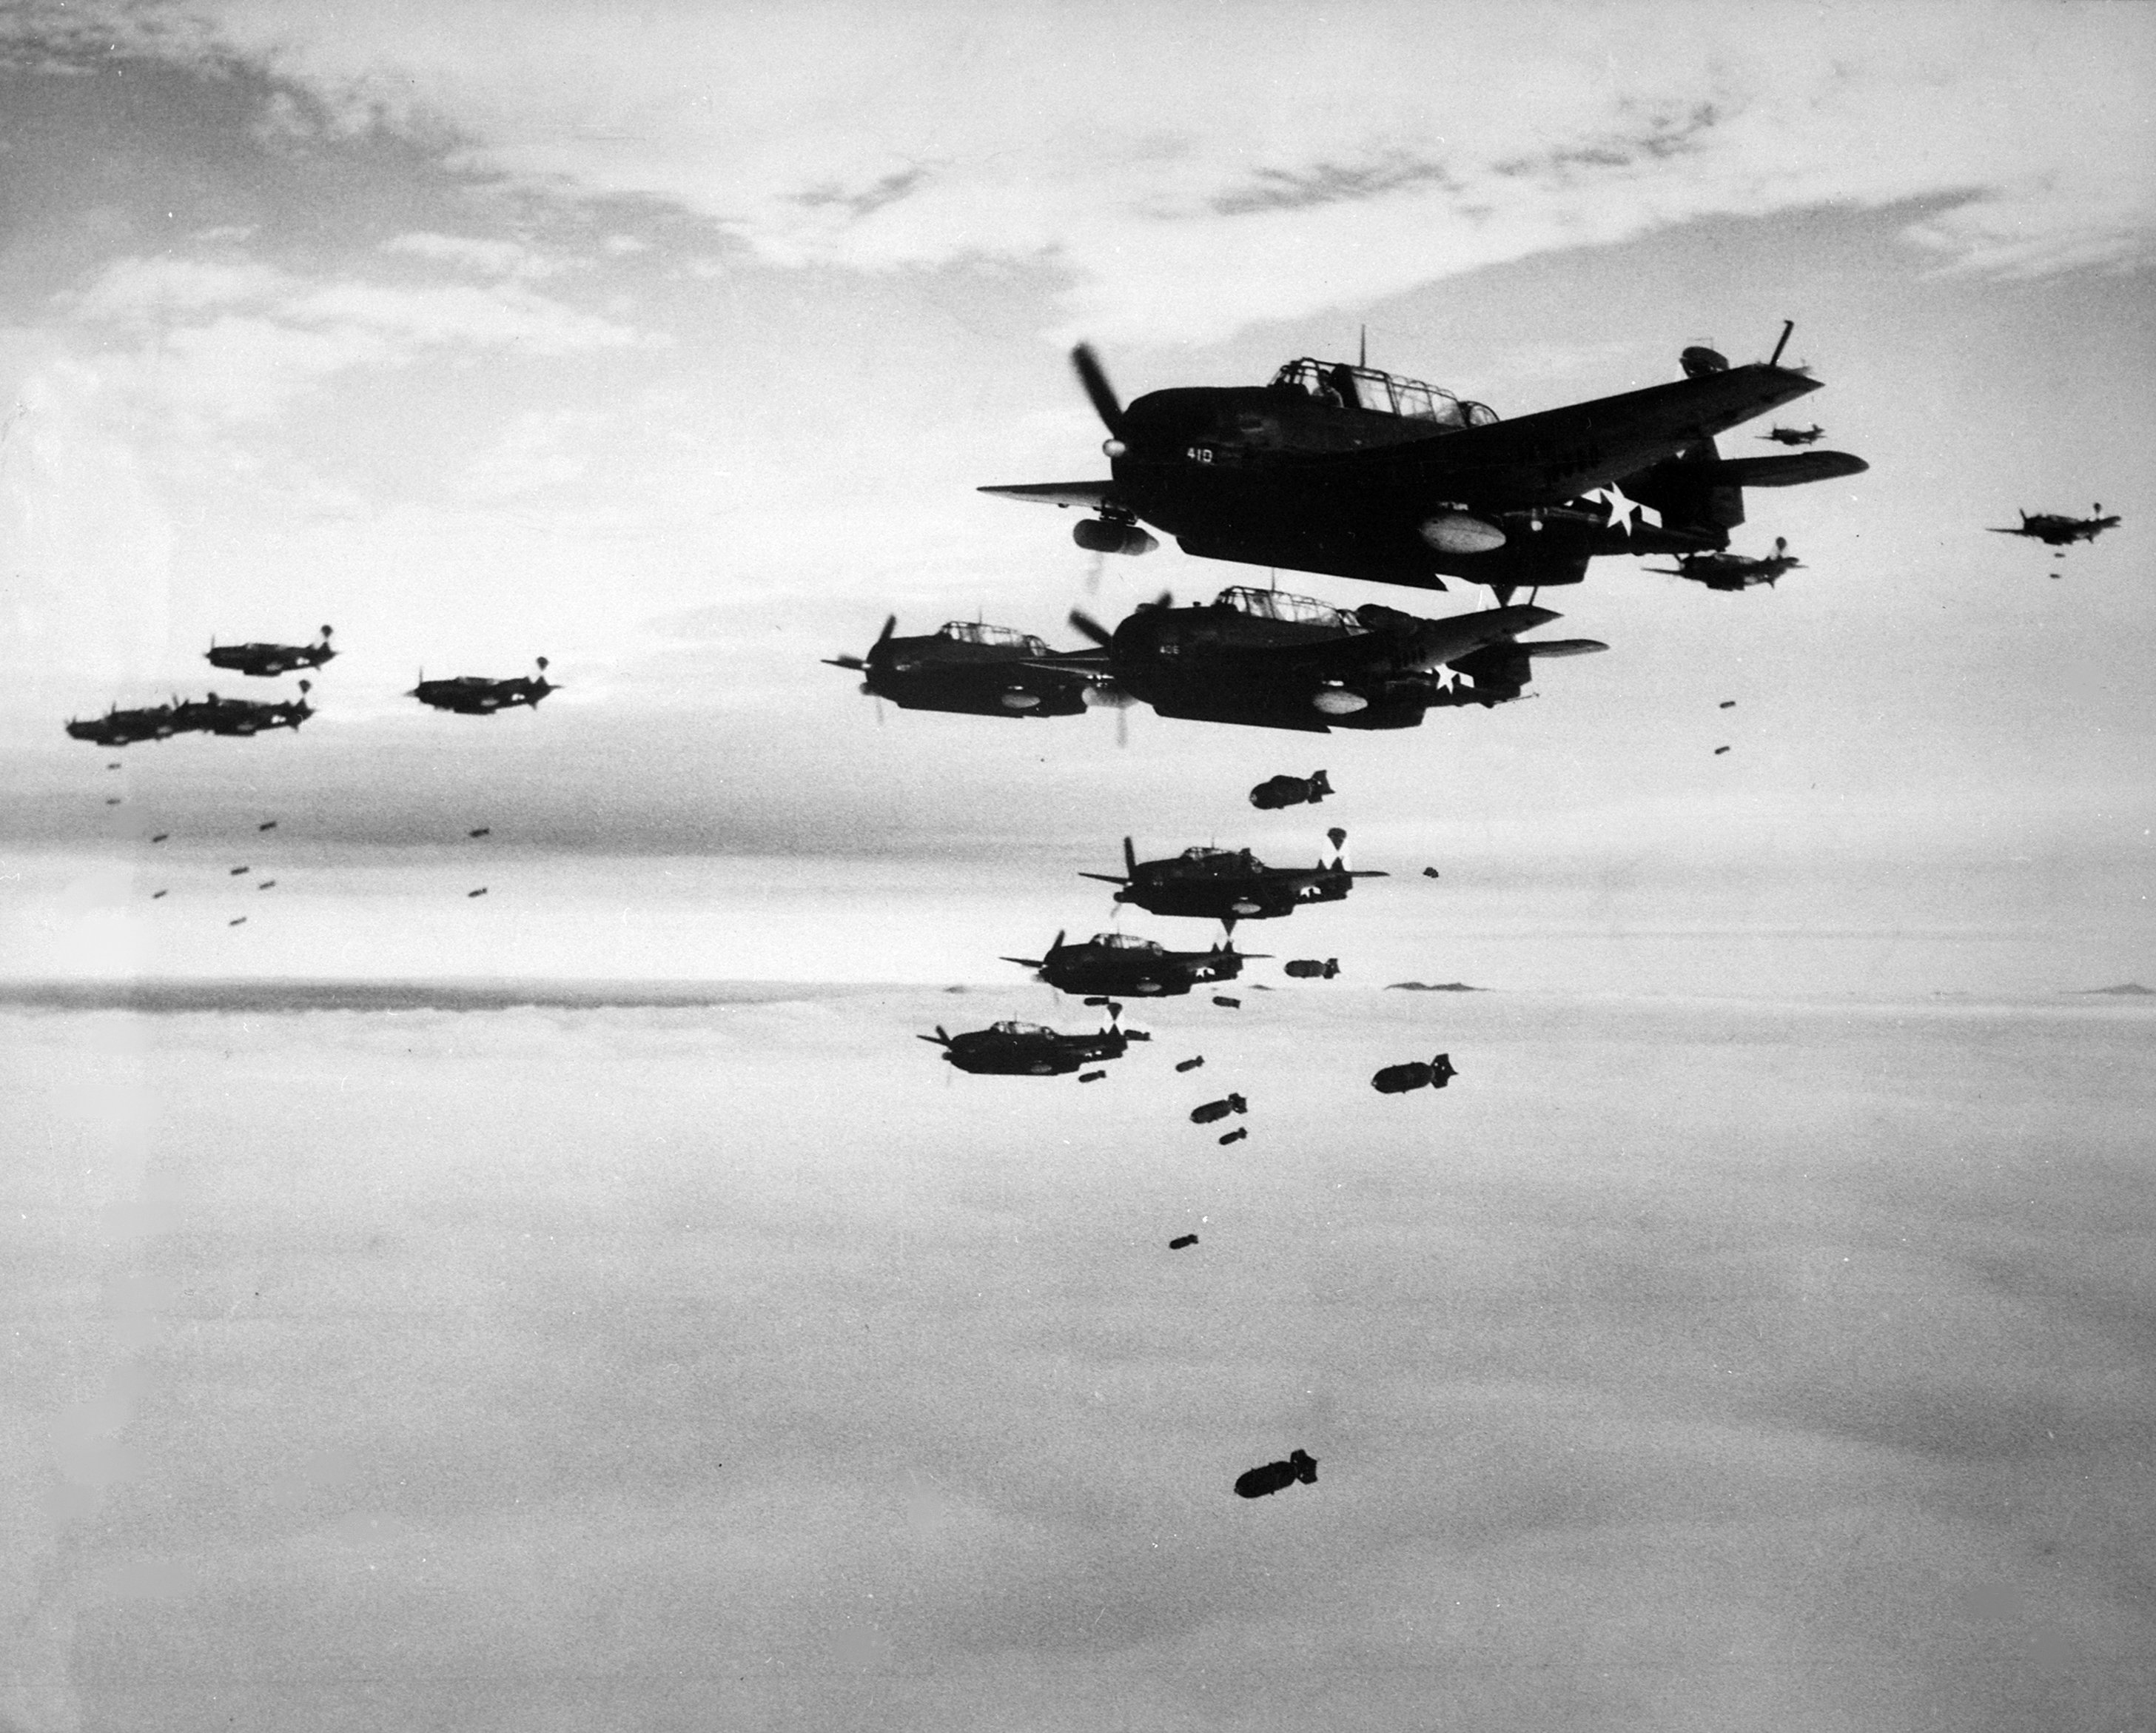 Air Attack Plane Naval Air Attacks[edit